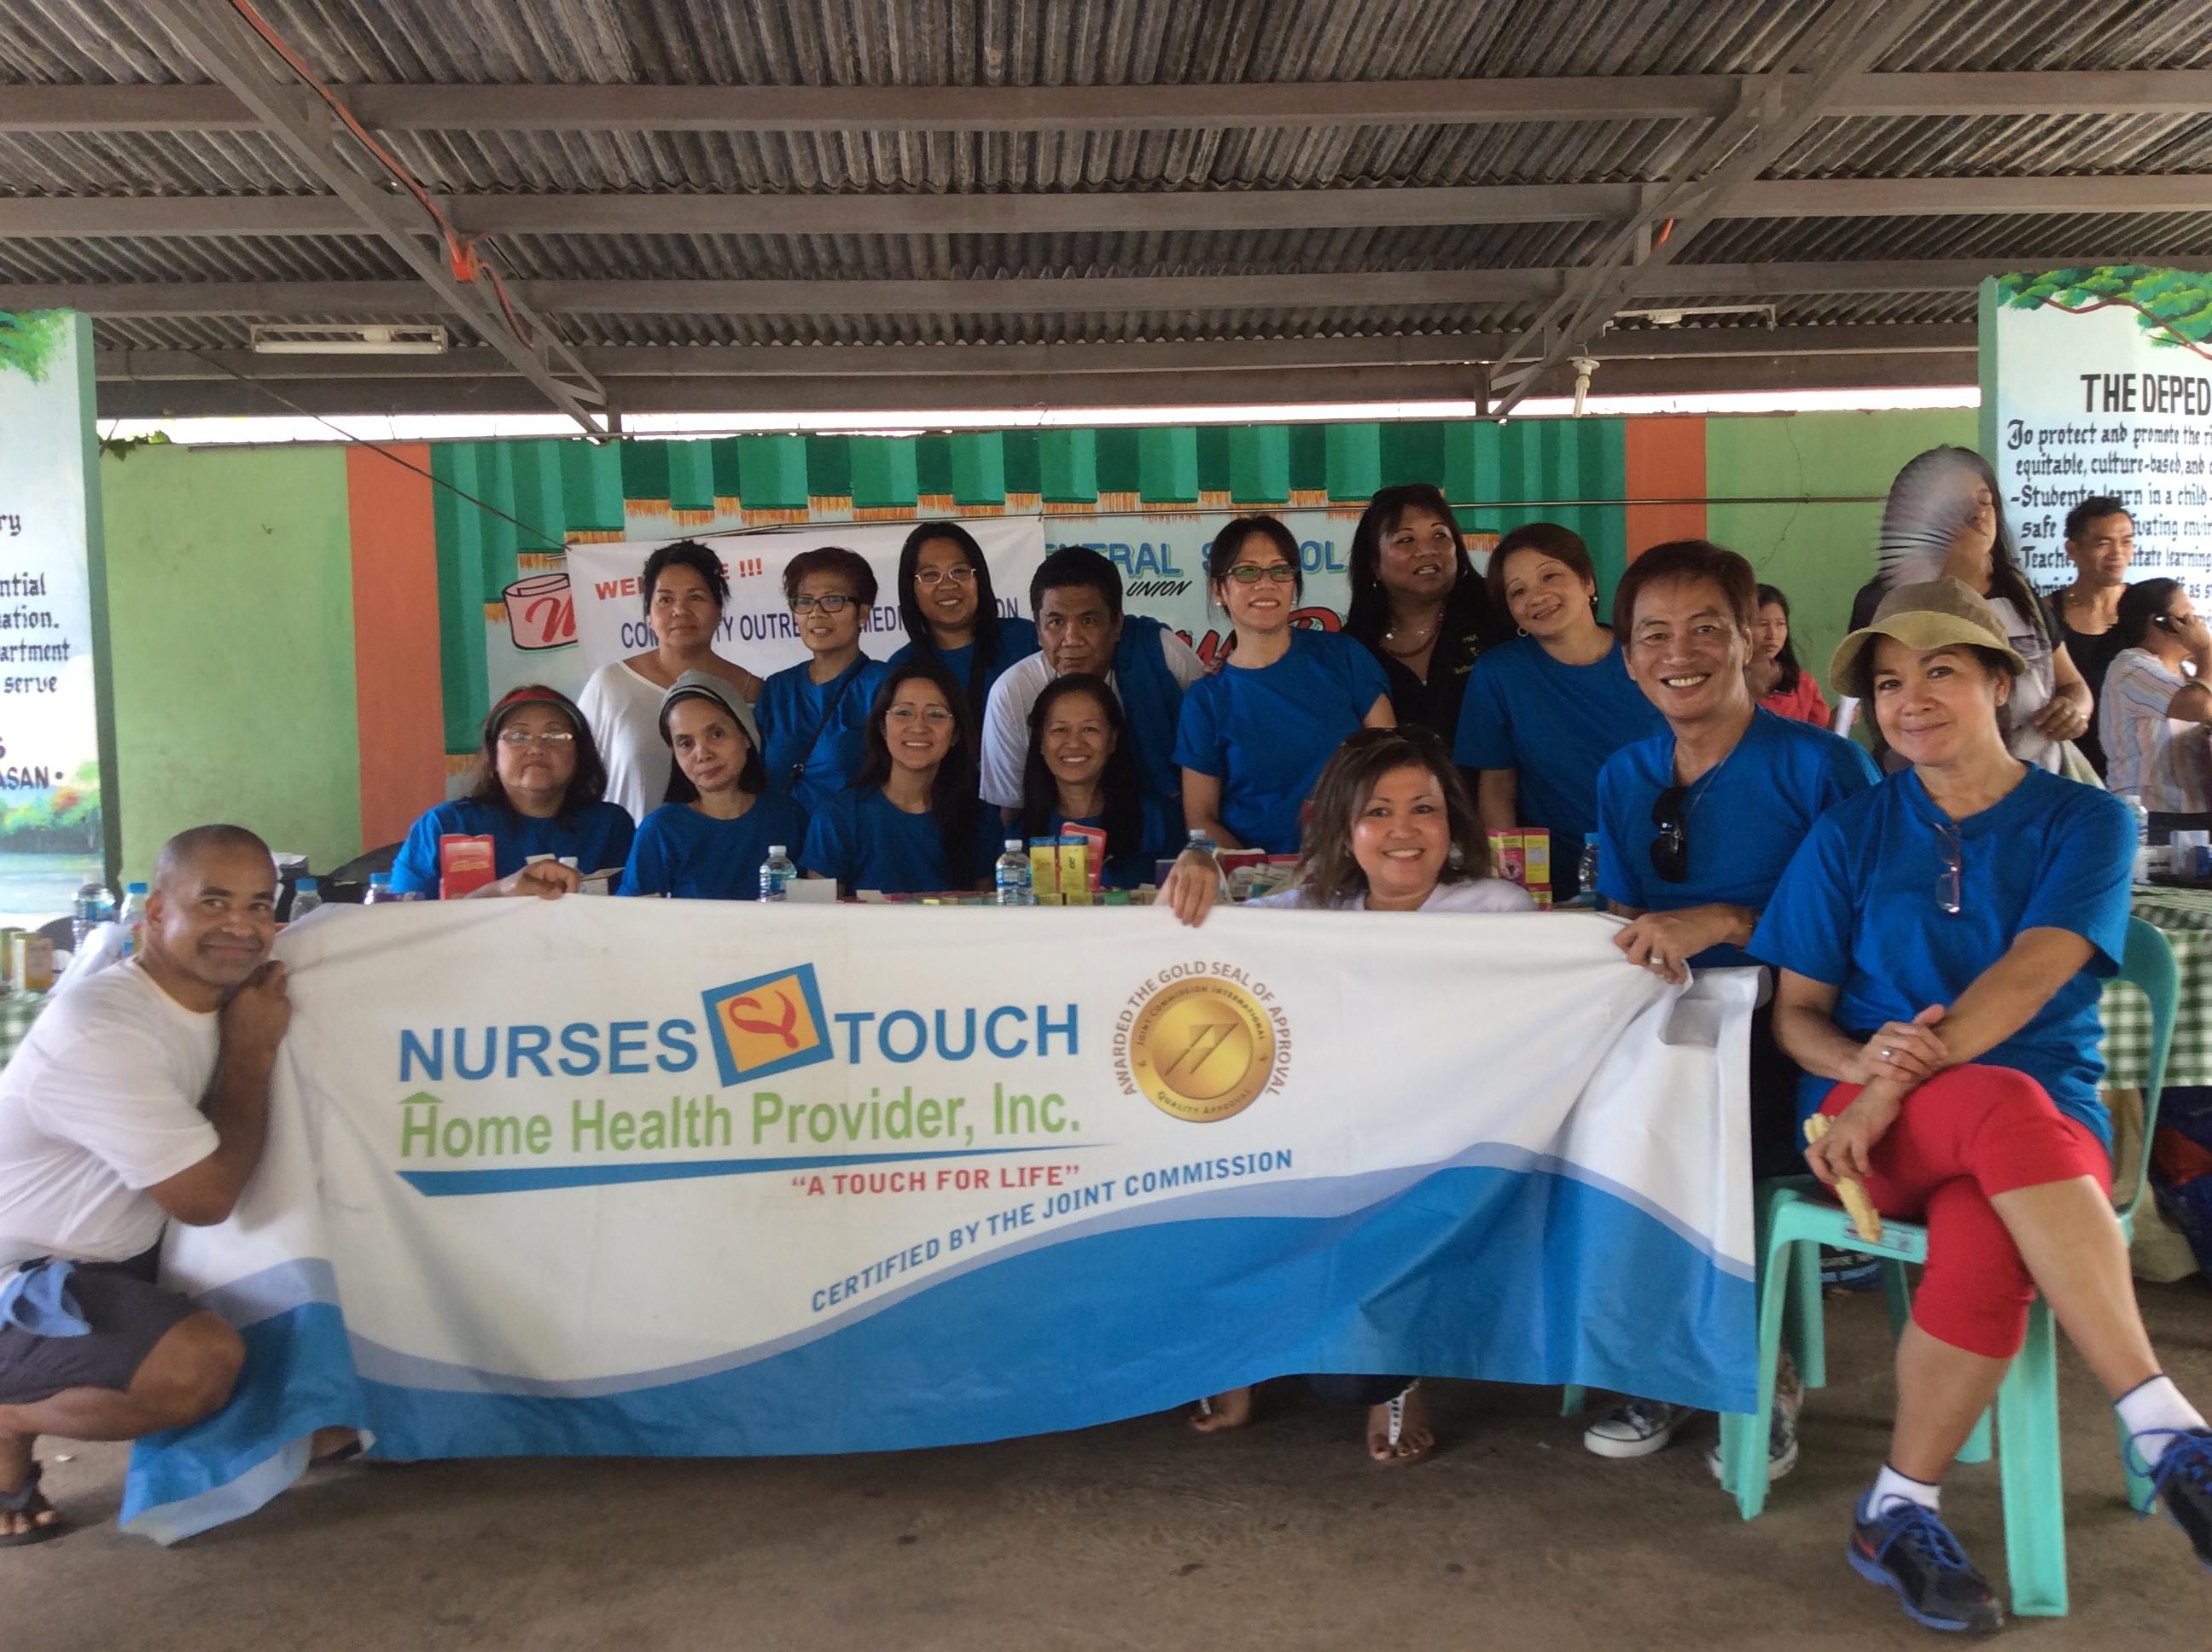 nurses touch banner